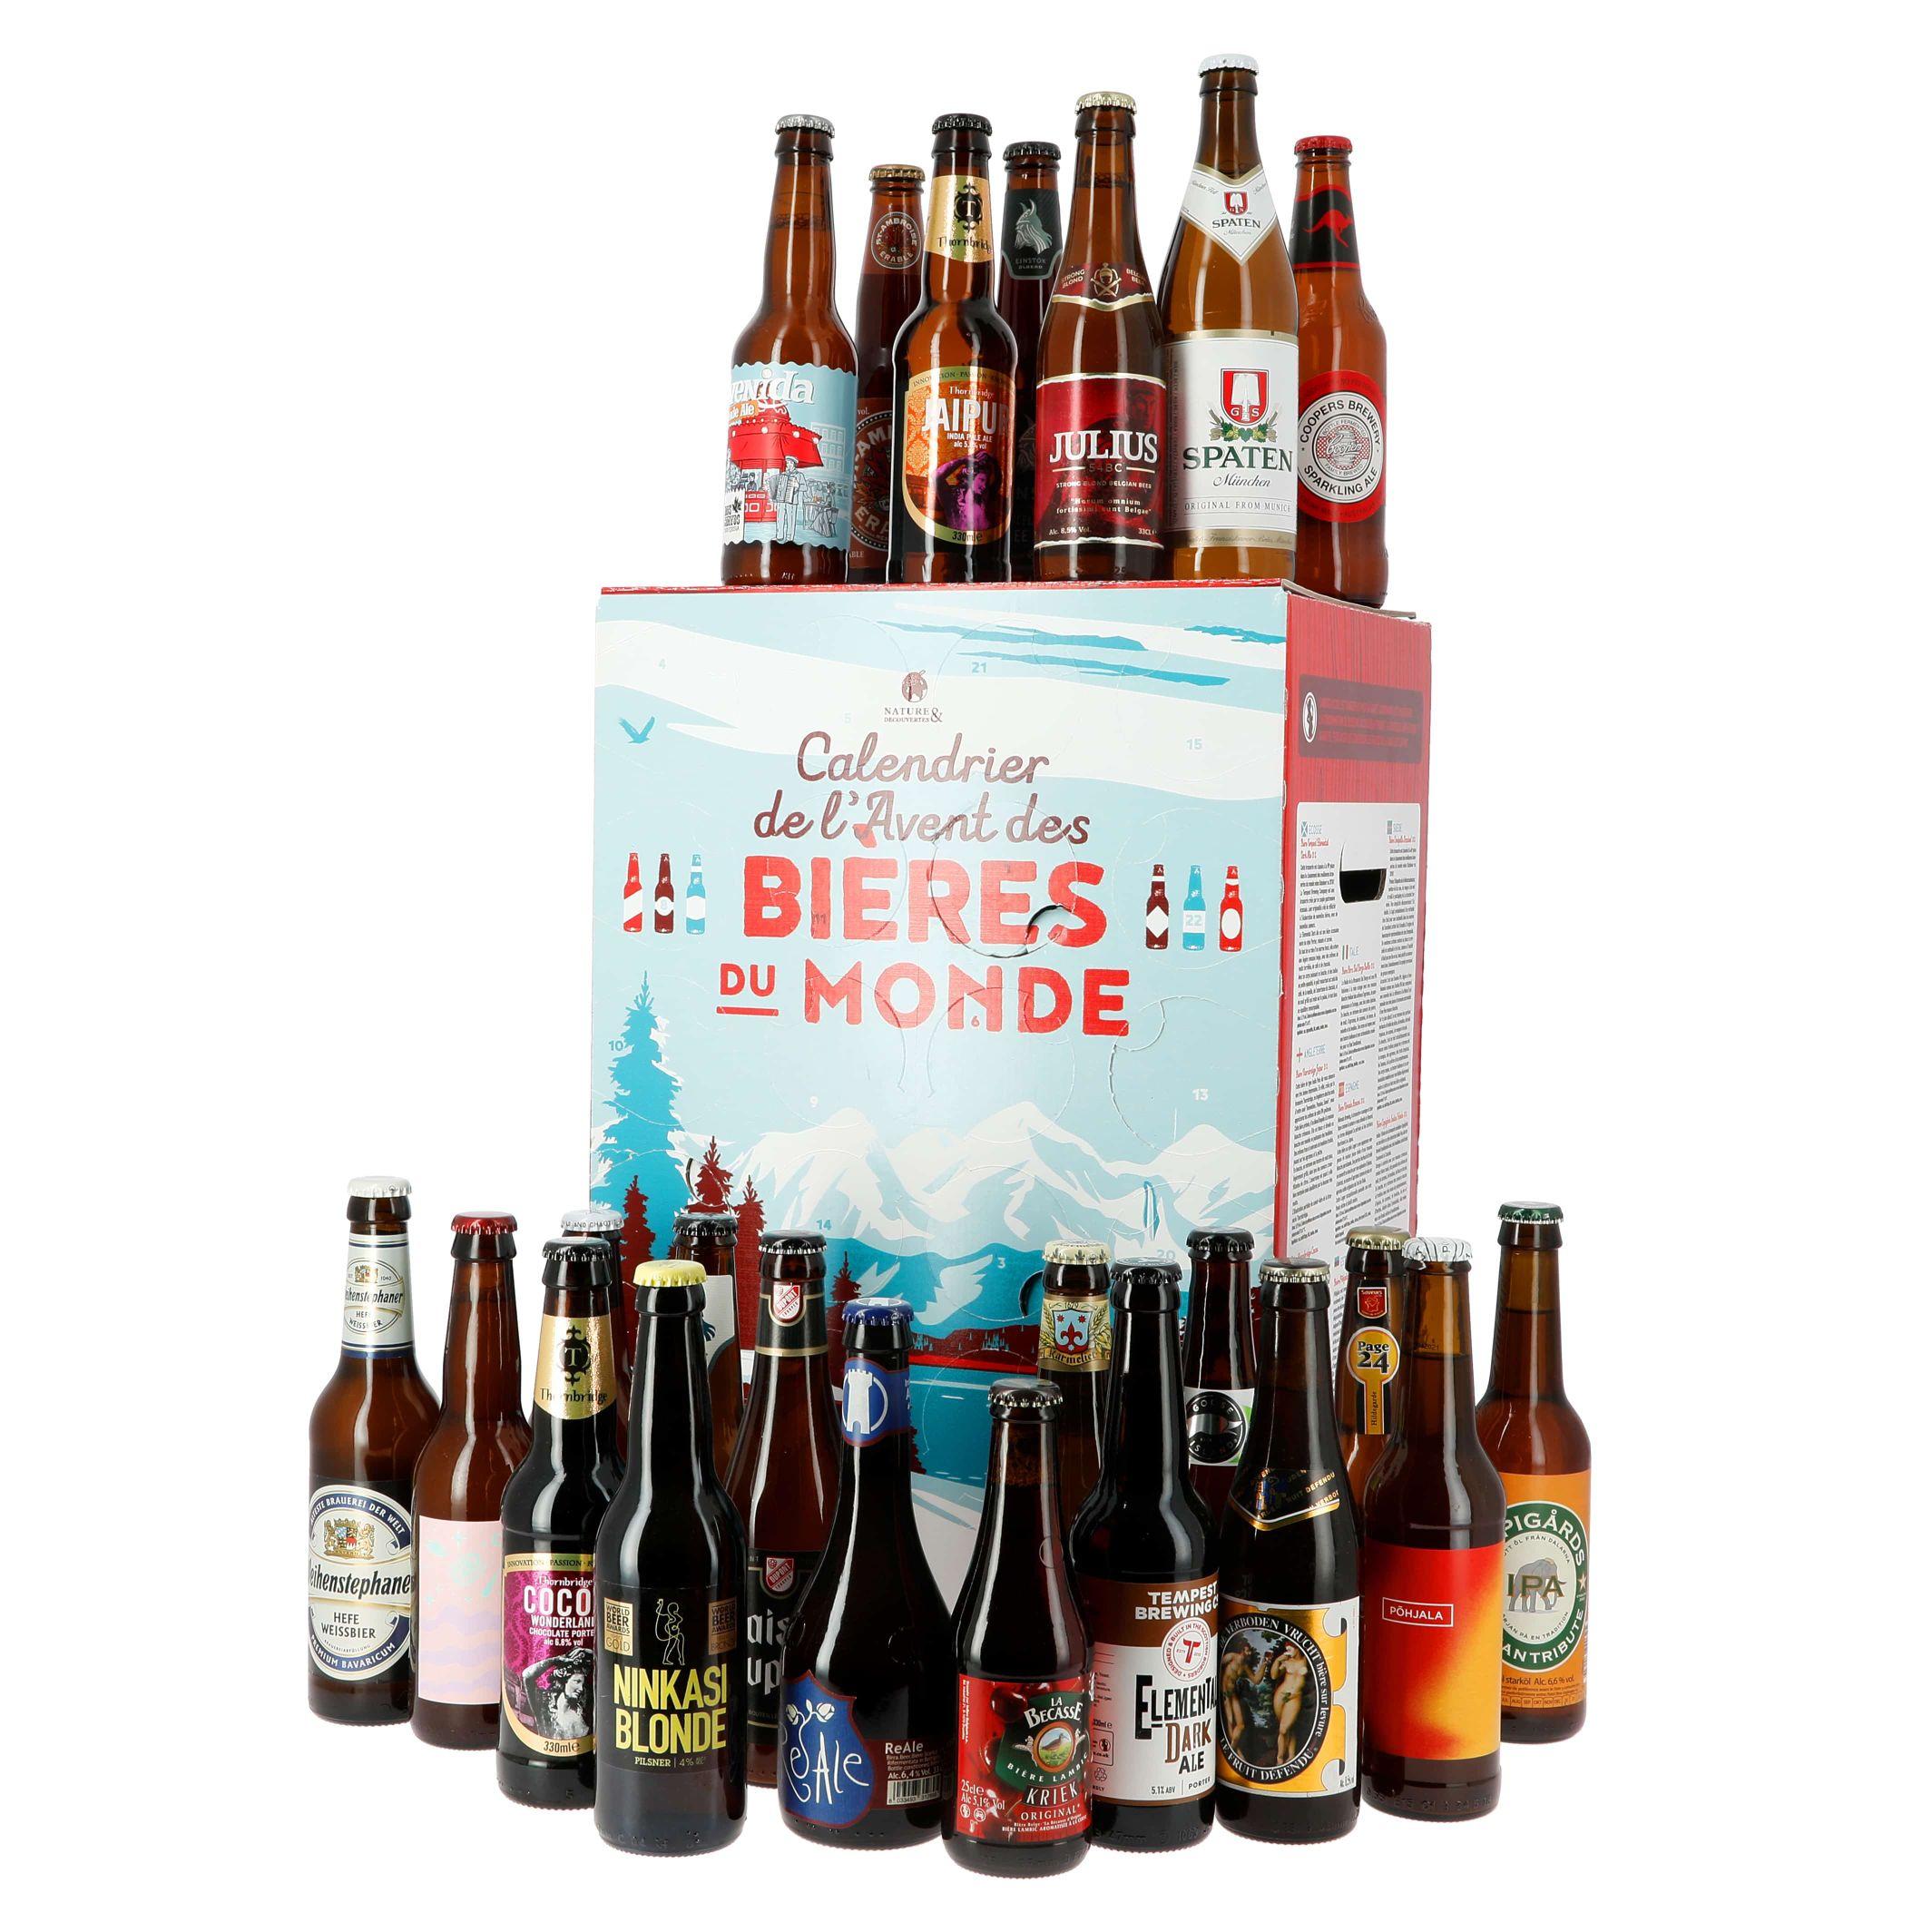 Calendrier de l'avent bières 2019